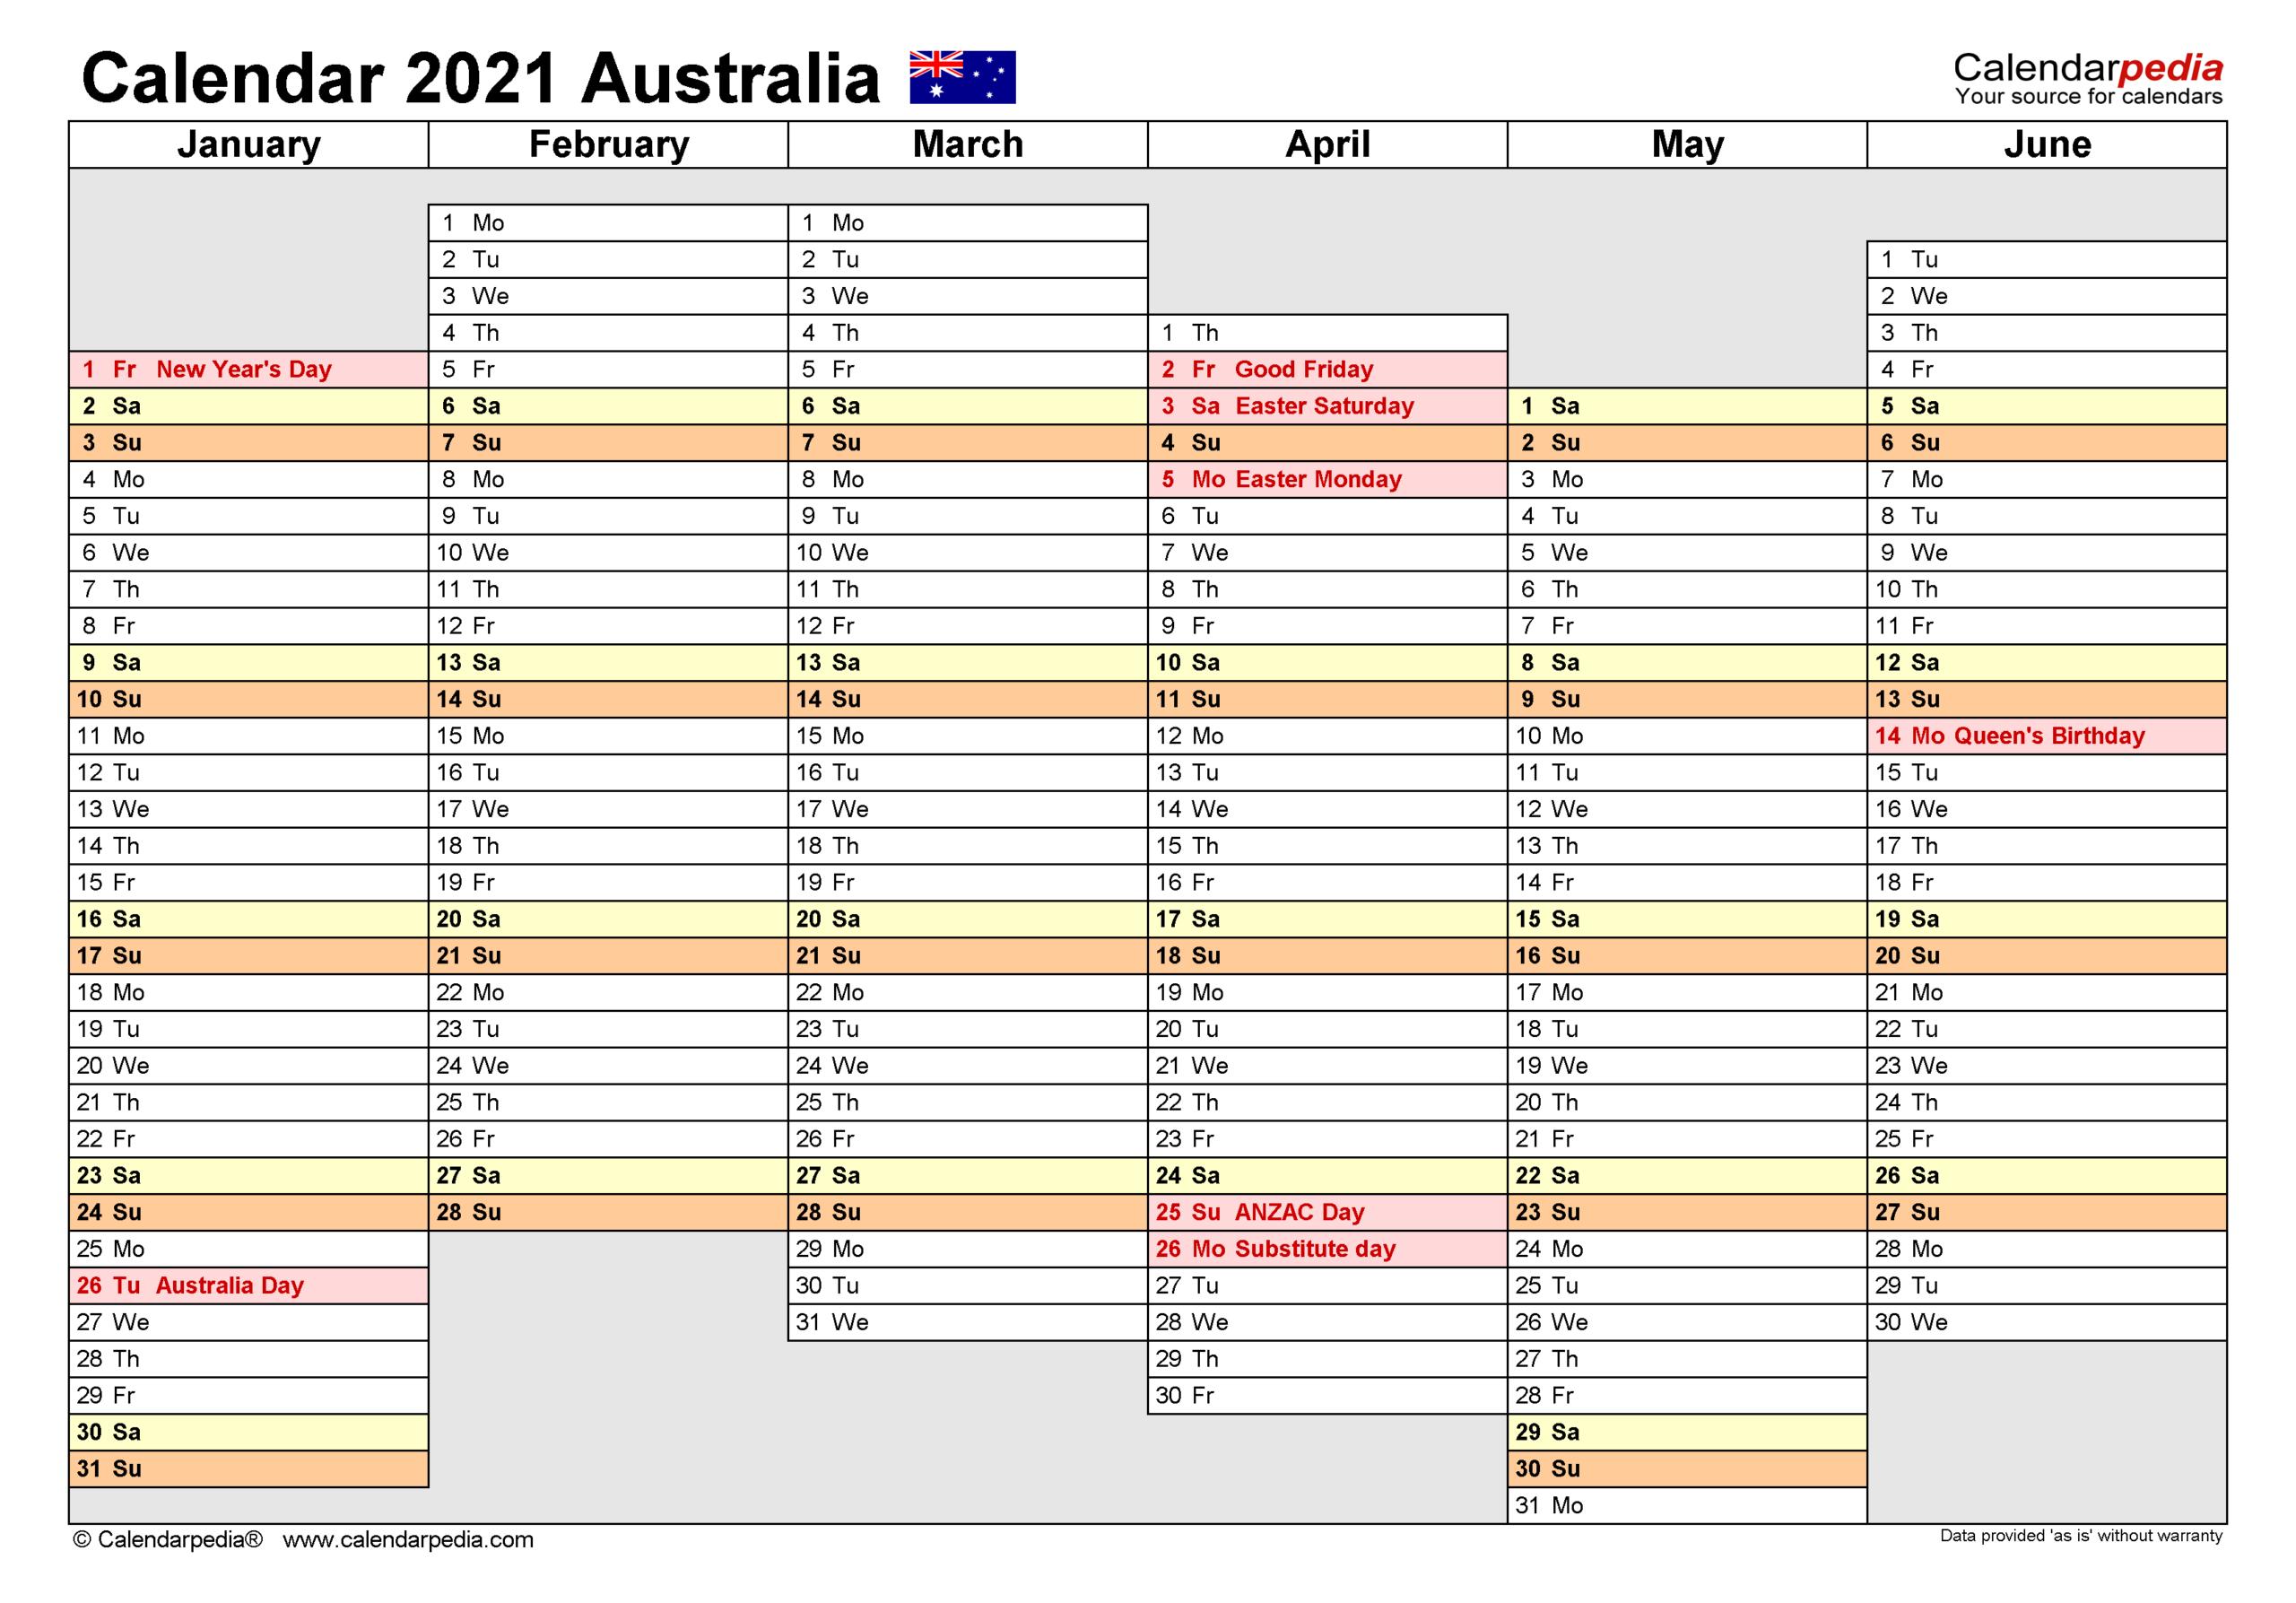 Australia Calendar 2021 - Free Printable Pdf Templates throughout 2021-2021 Two Year Planner: Calendar